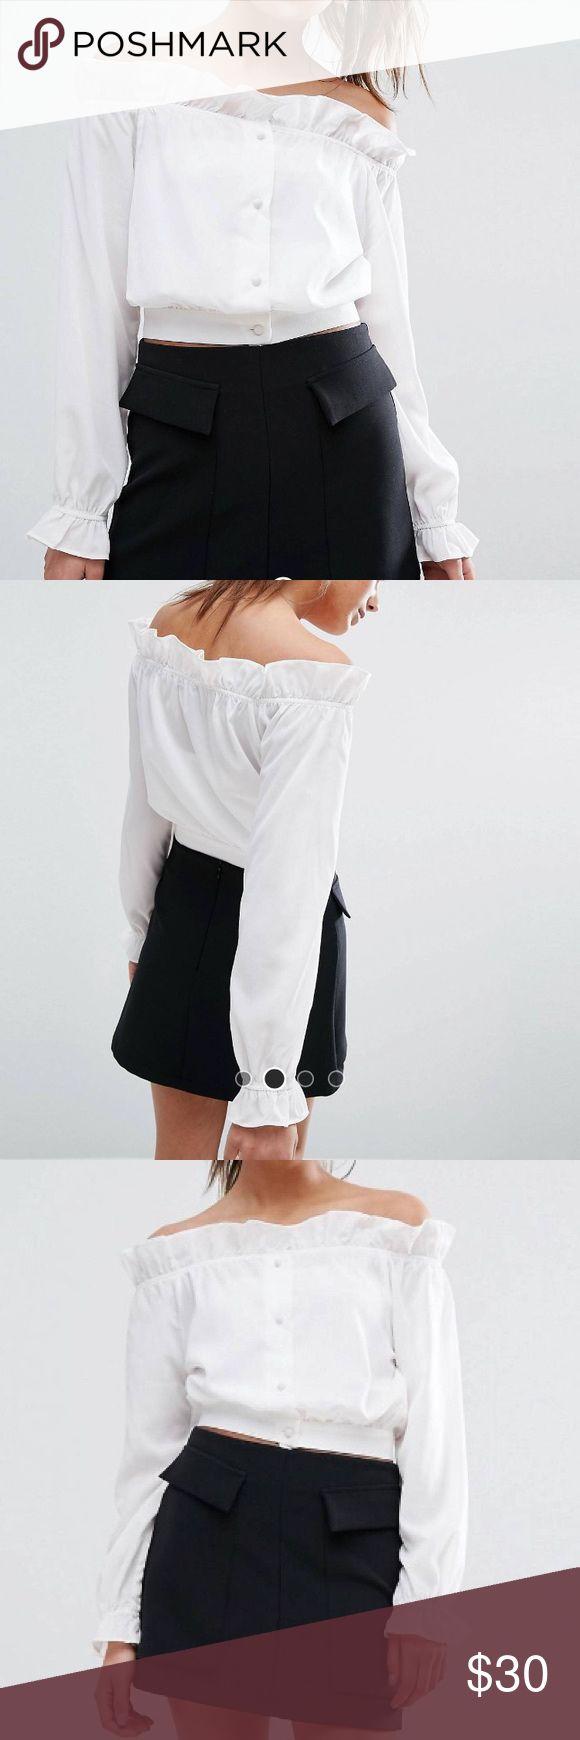 ASOS- White Off Shoulder Ruffle Detail Bardot Top ASOS- White Off Shoulder Ruffle Detail Bardot Top- never worn! ASOS Tops Blouses